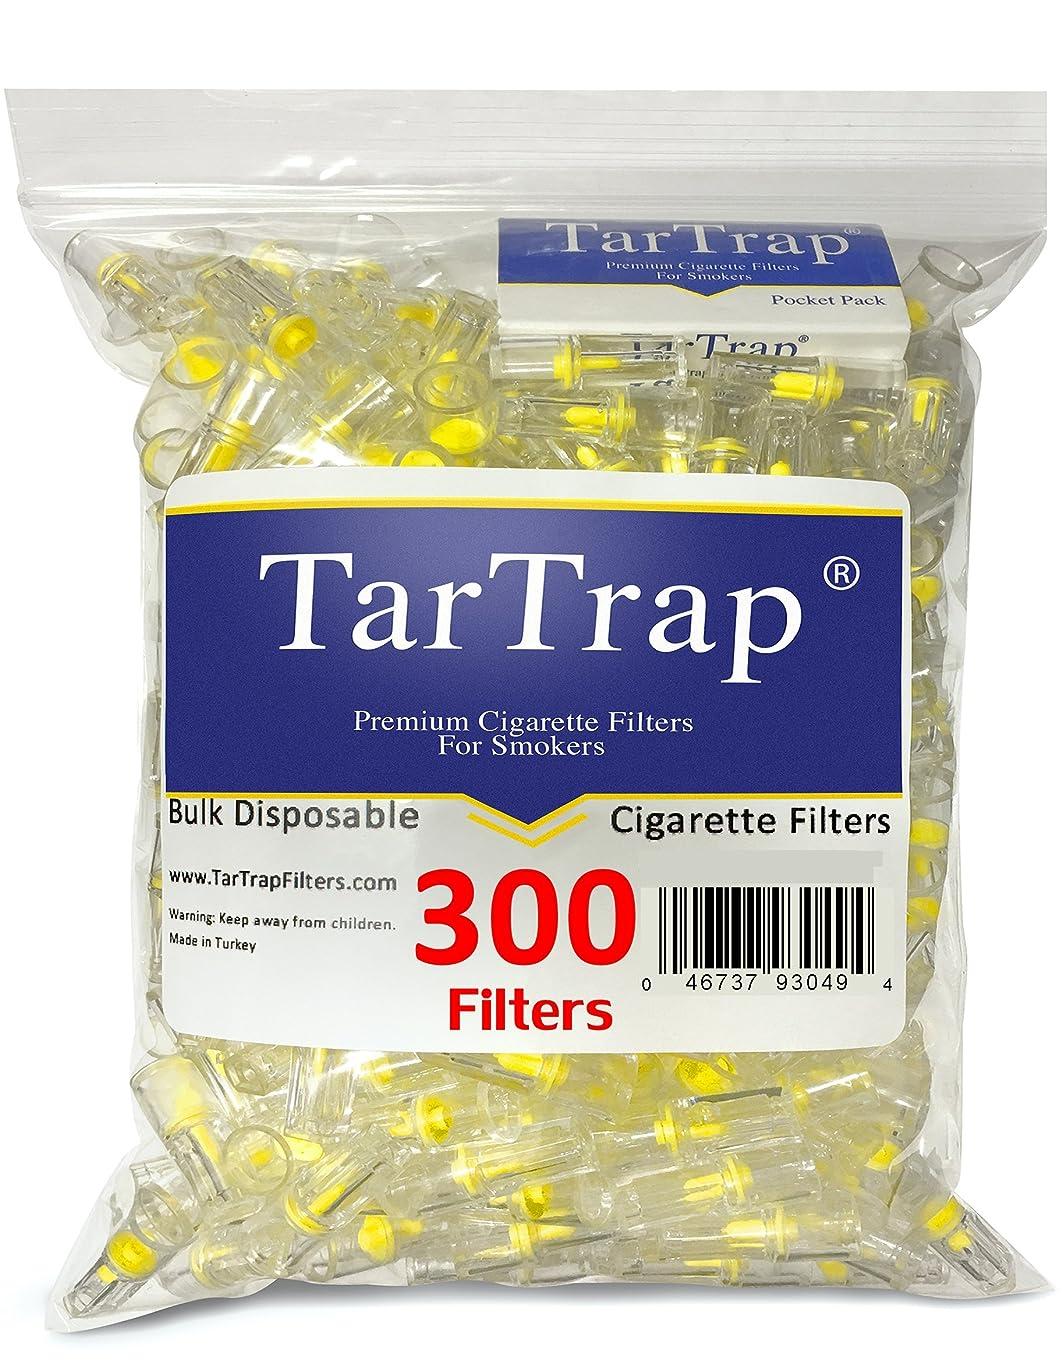 TarTrap Disposable Cigarette Filters, 300 per Pack